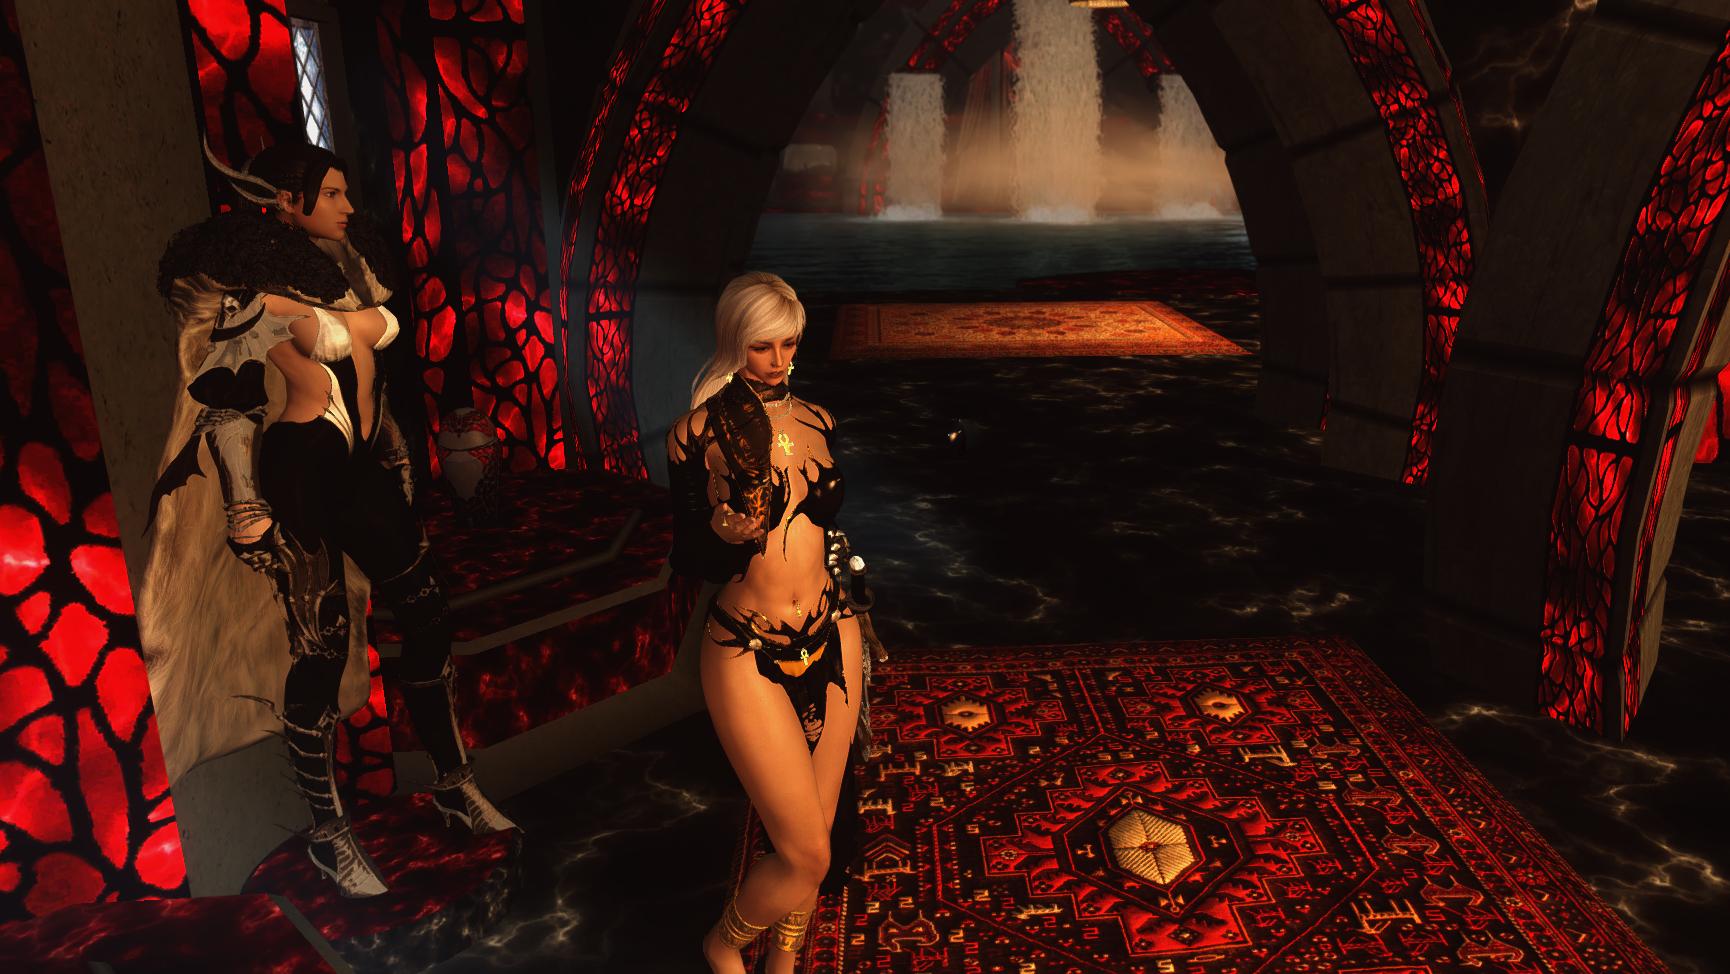 Desktop Screenshot 2019.11.10 - 16.26.54.03.png - Elder Scrolls 5: Skyrim, the